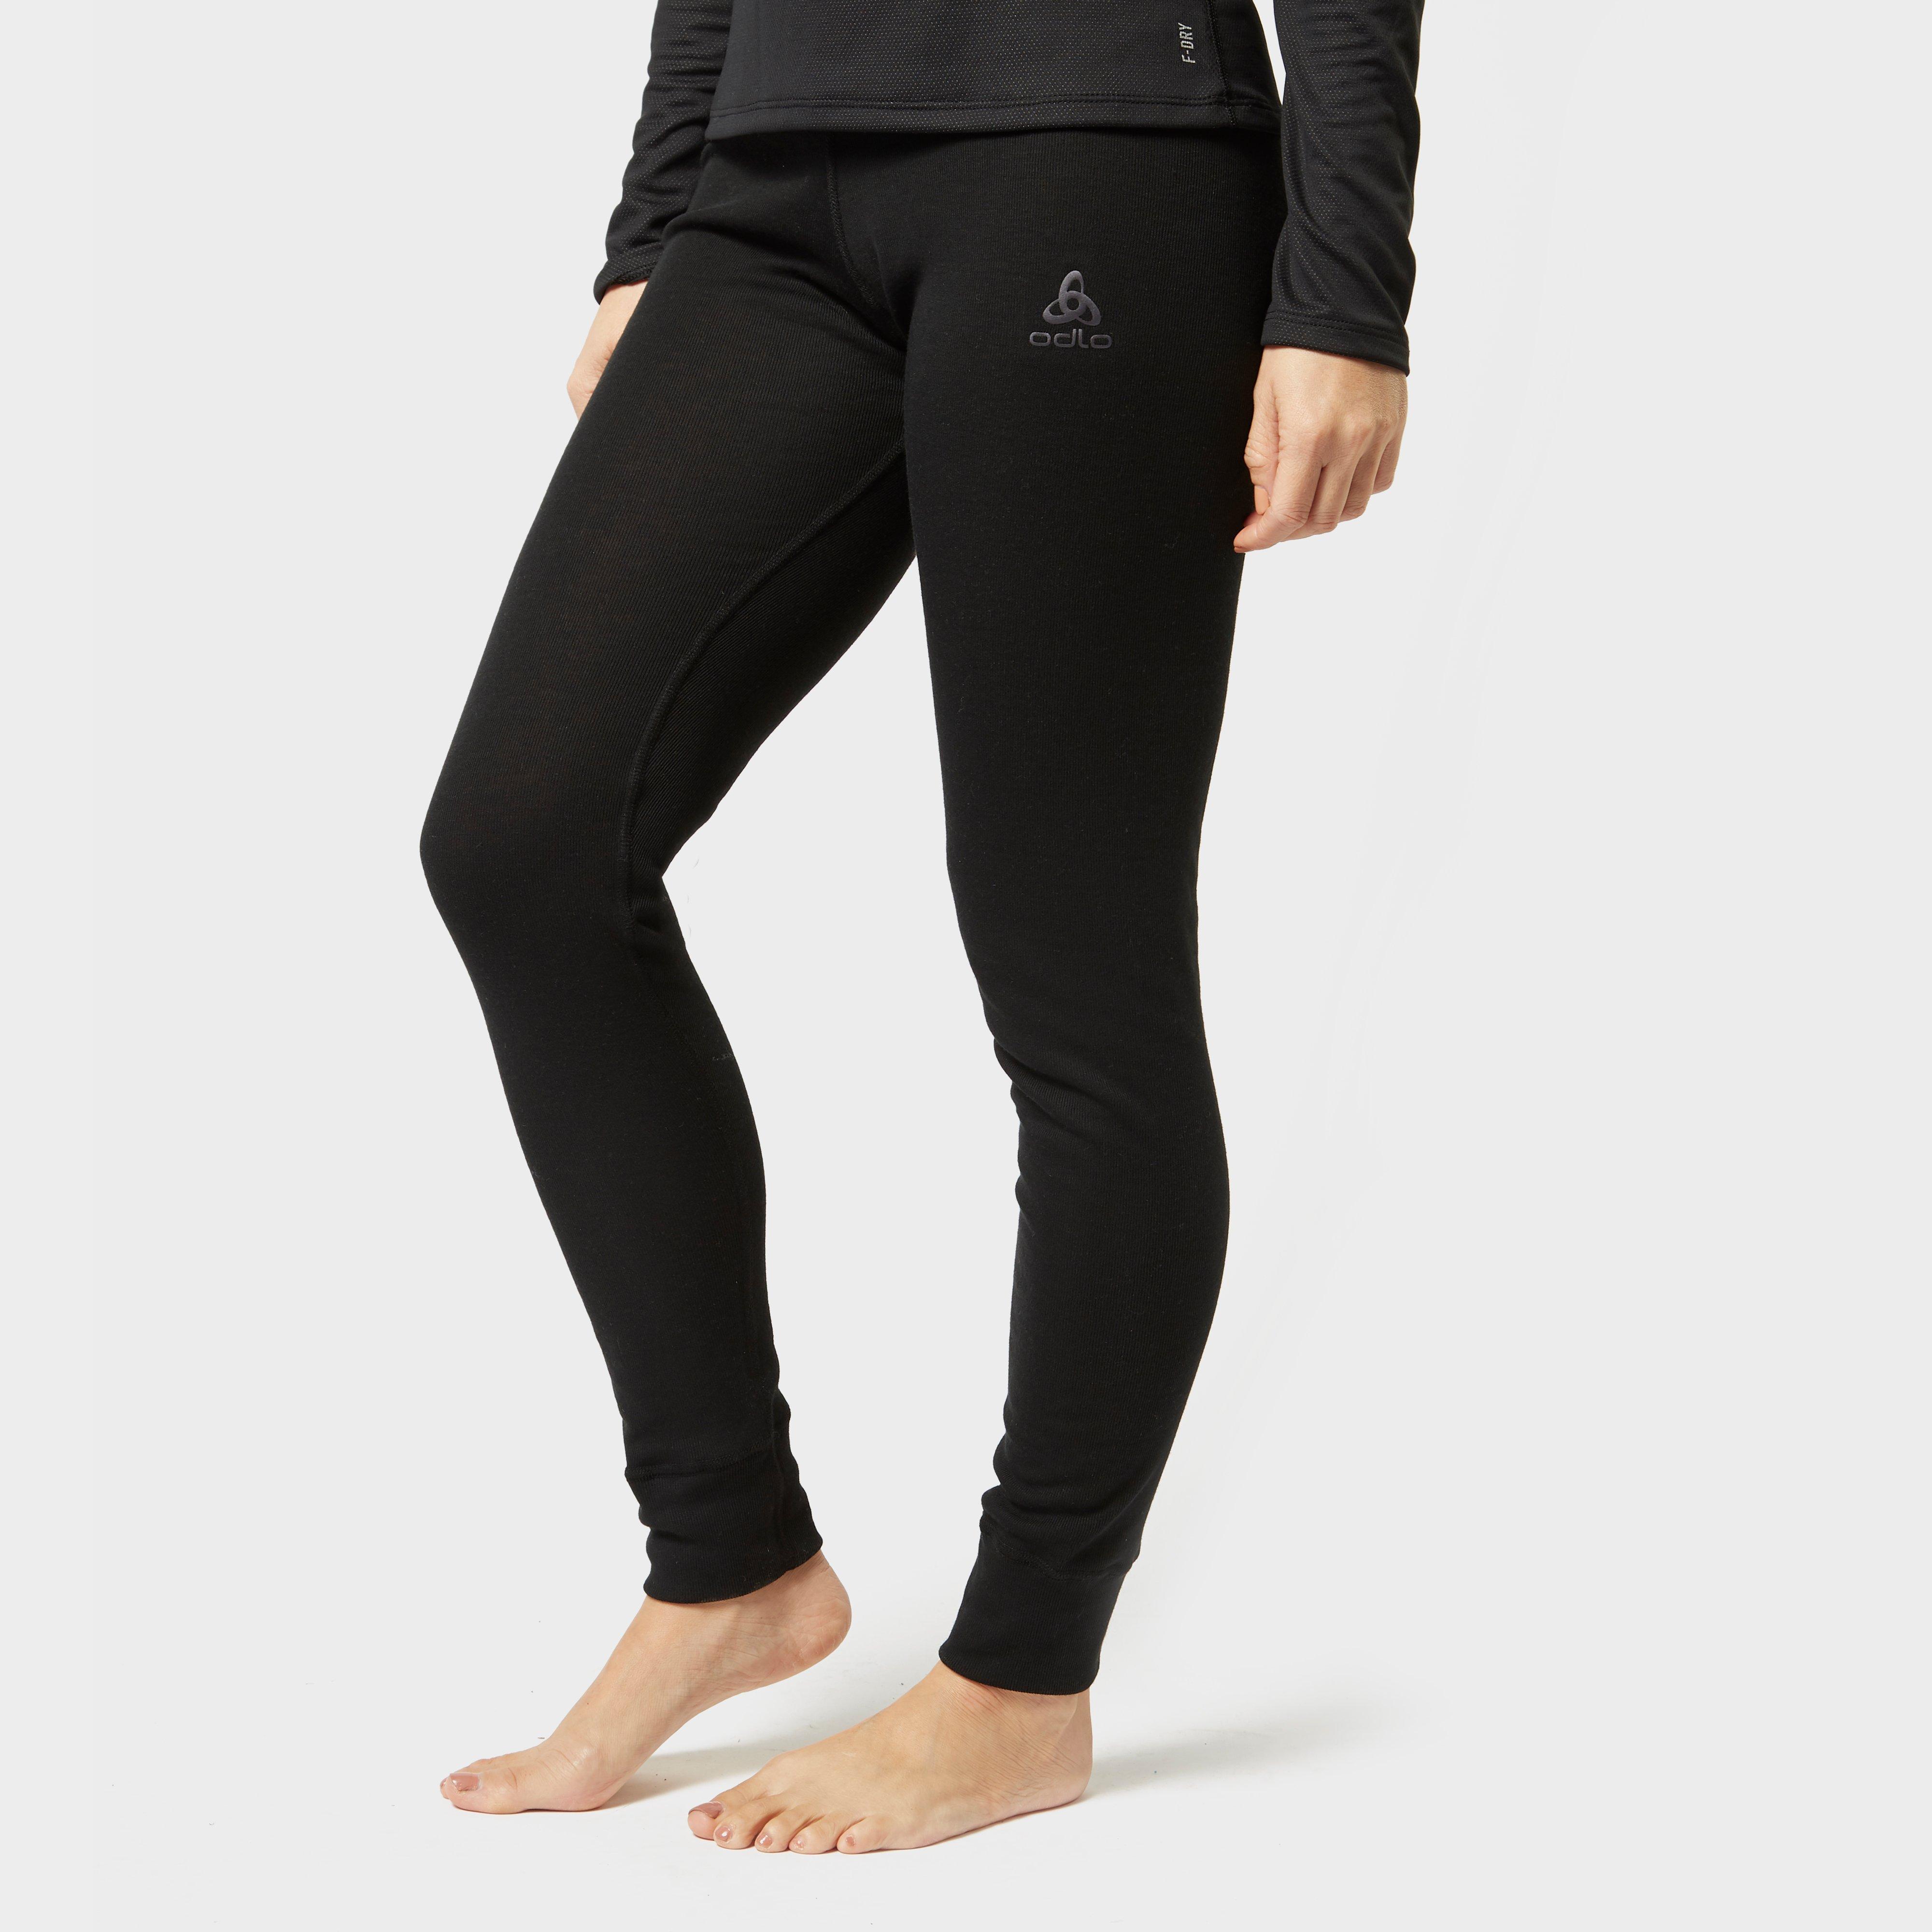 Odlo Odlo Womens Active Warm Pant - Black, Black